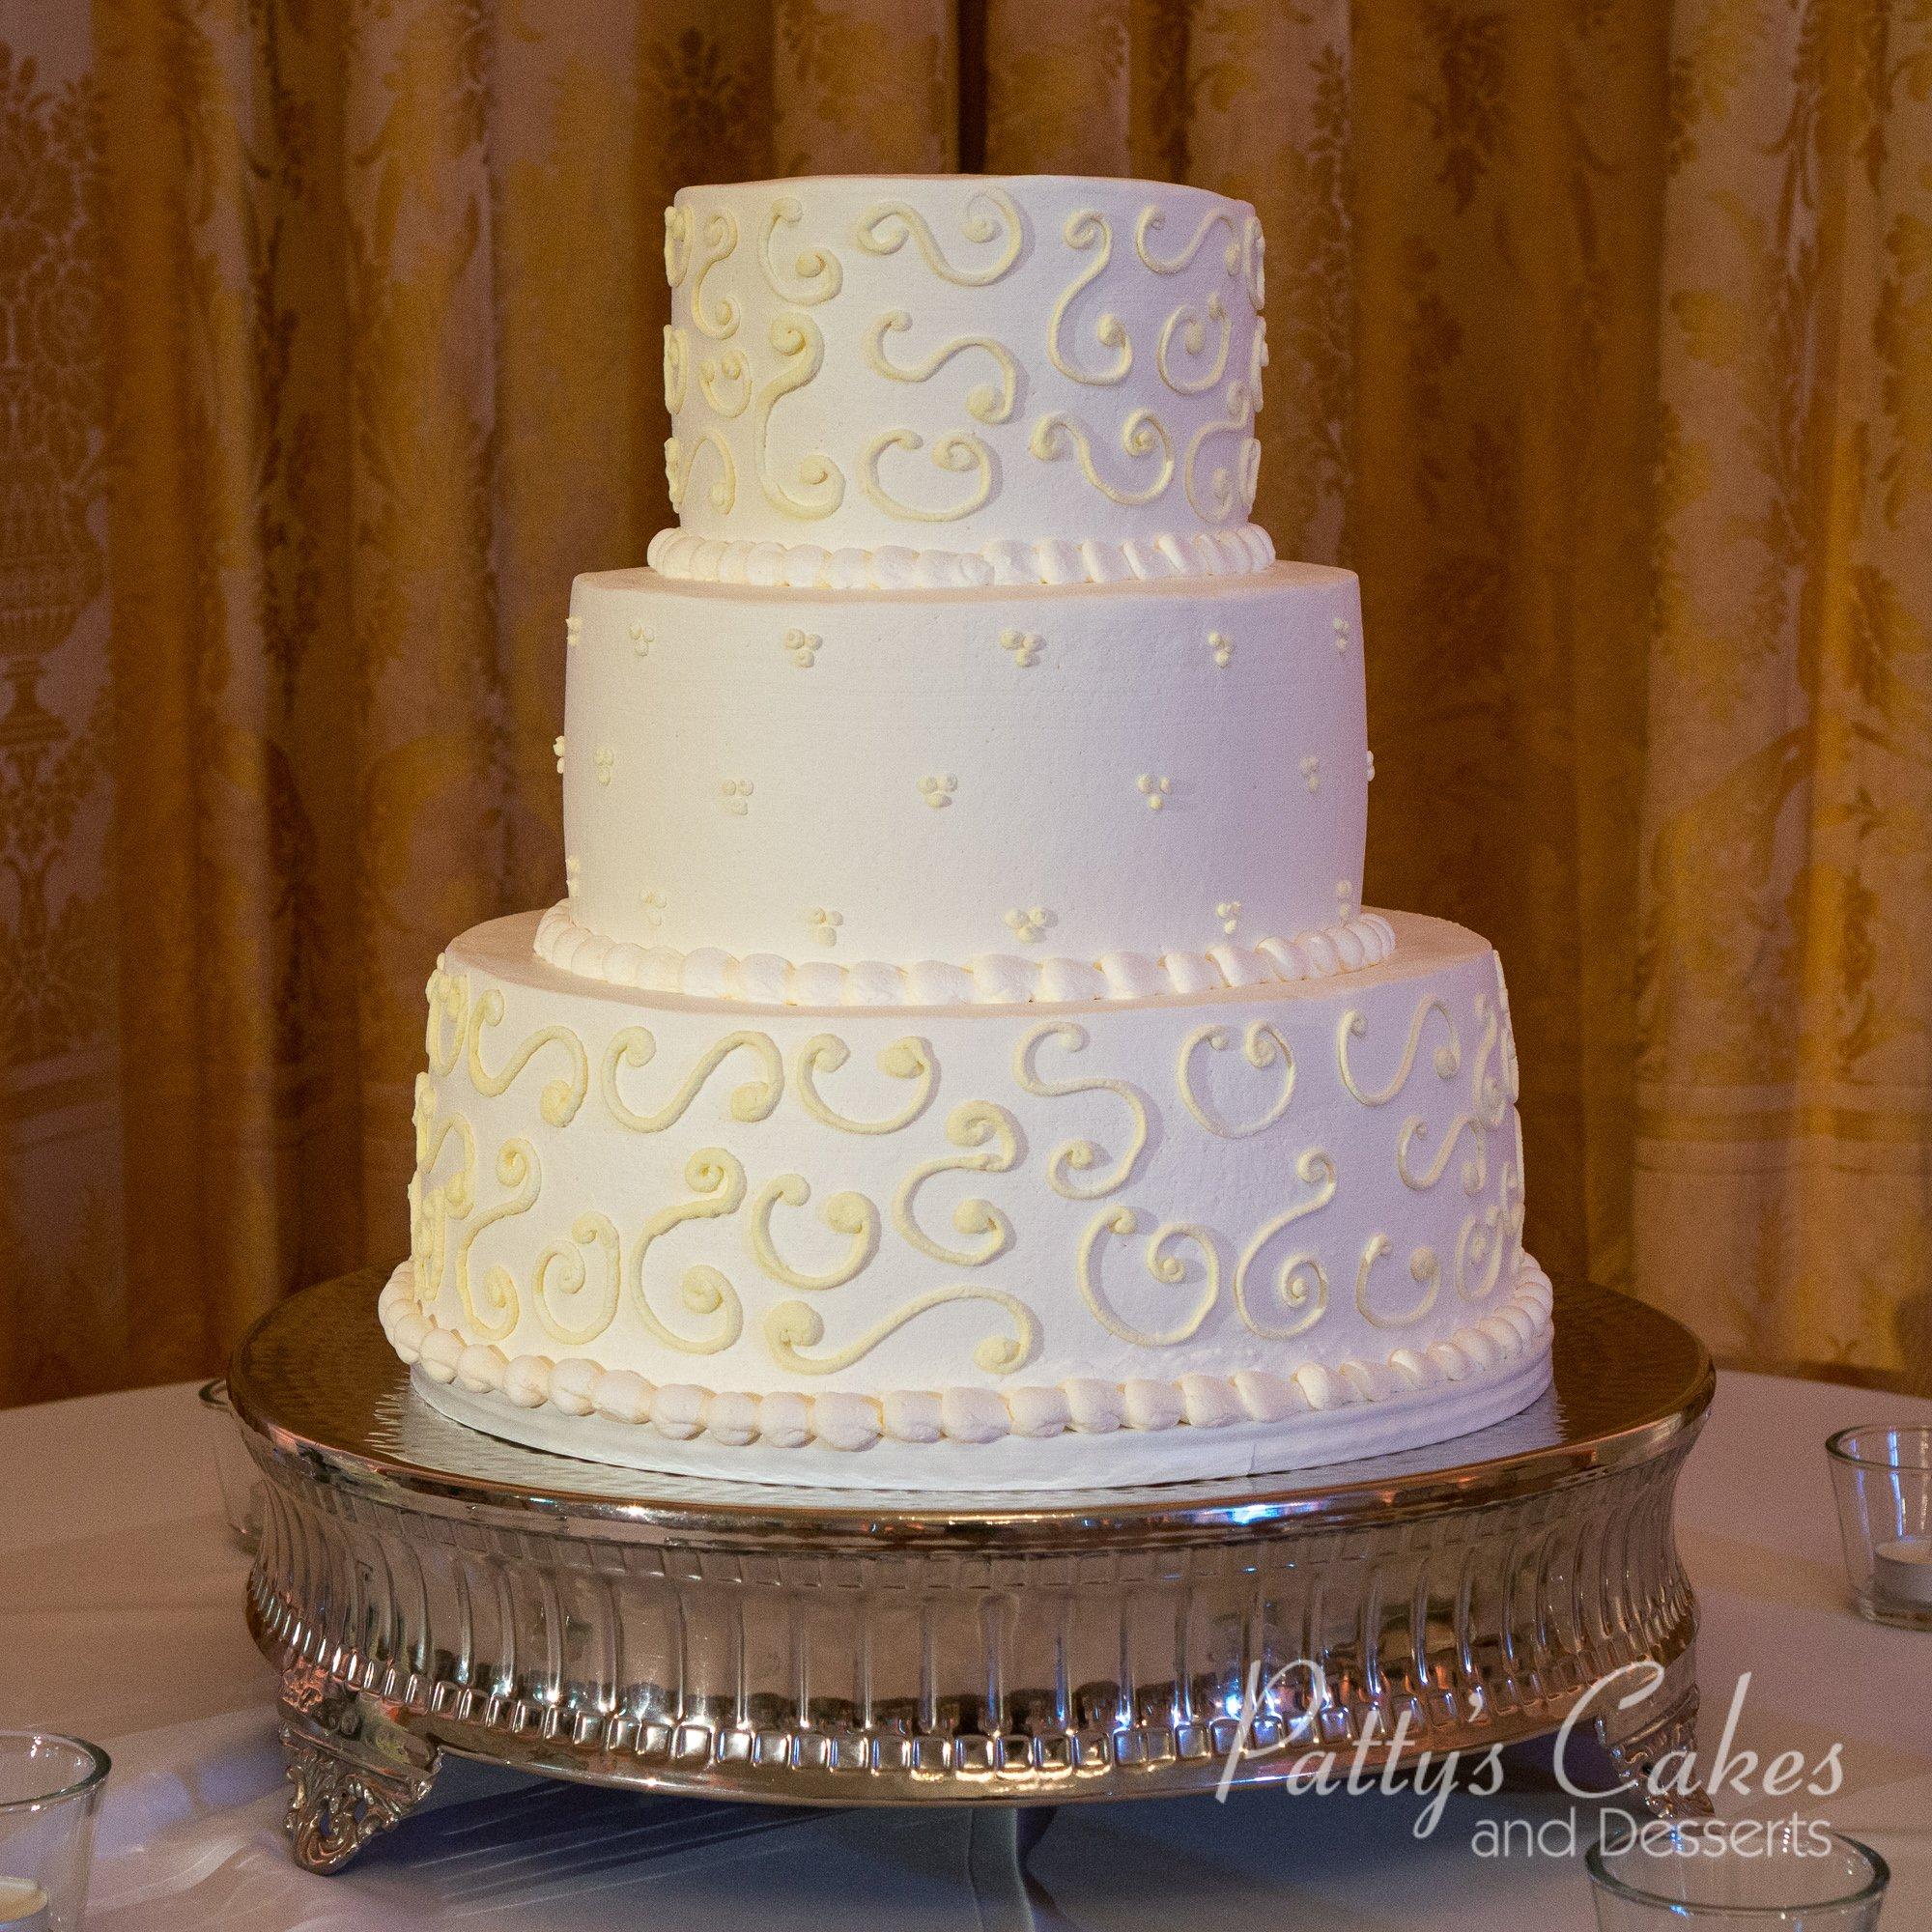 Small Wedding Cakes: Photo Of A Small Wedding Cake